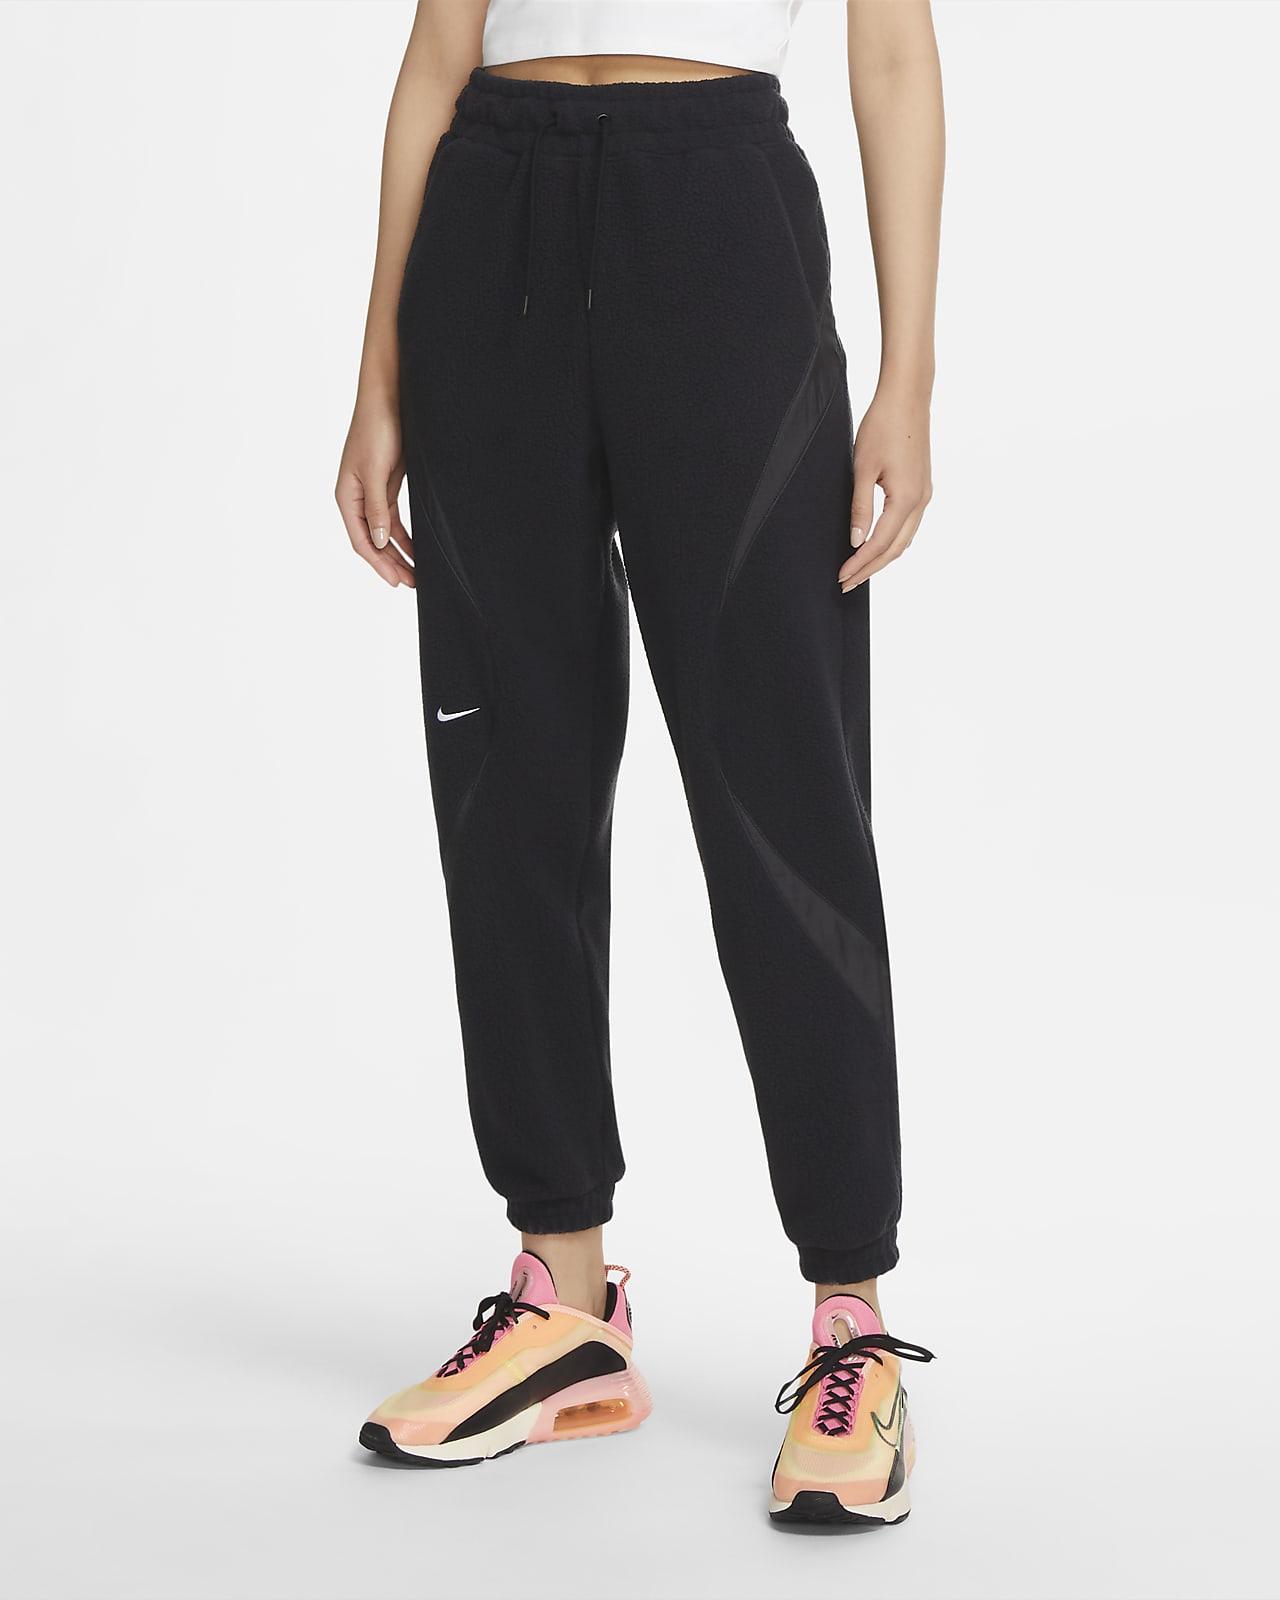 Nike Sportswear Women's Archive Remix Pants